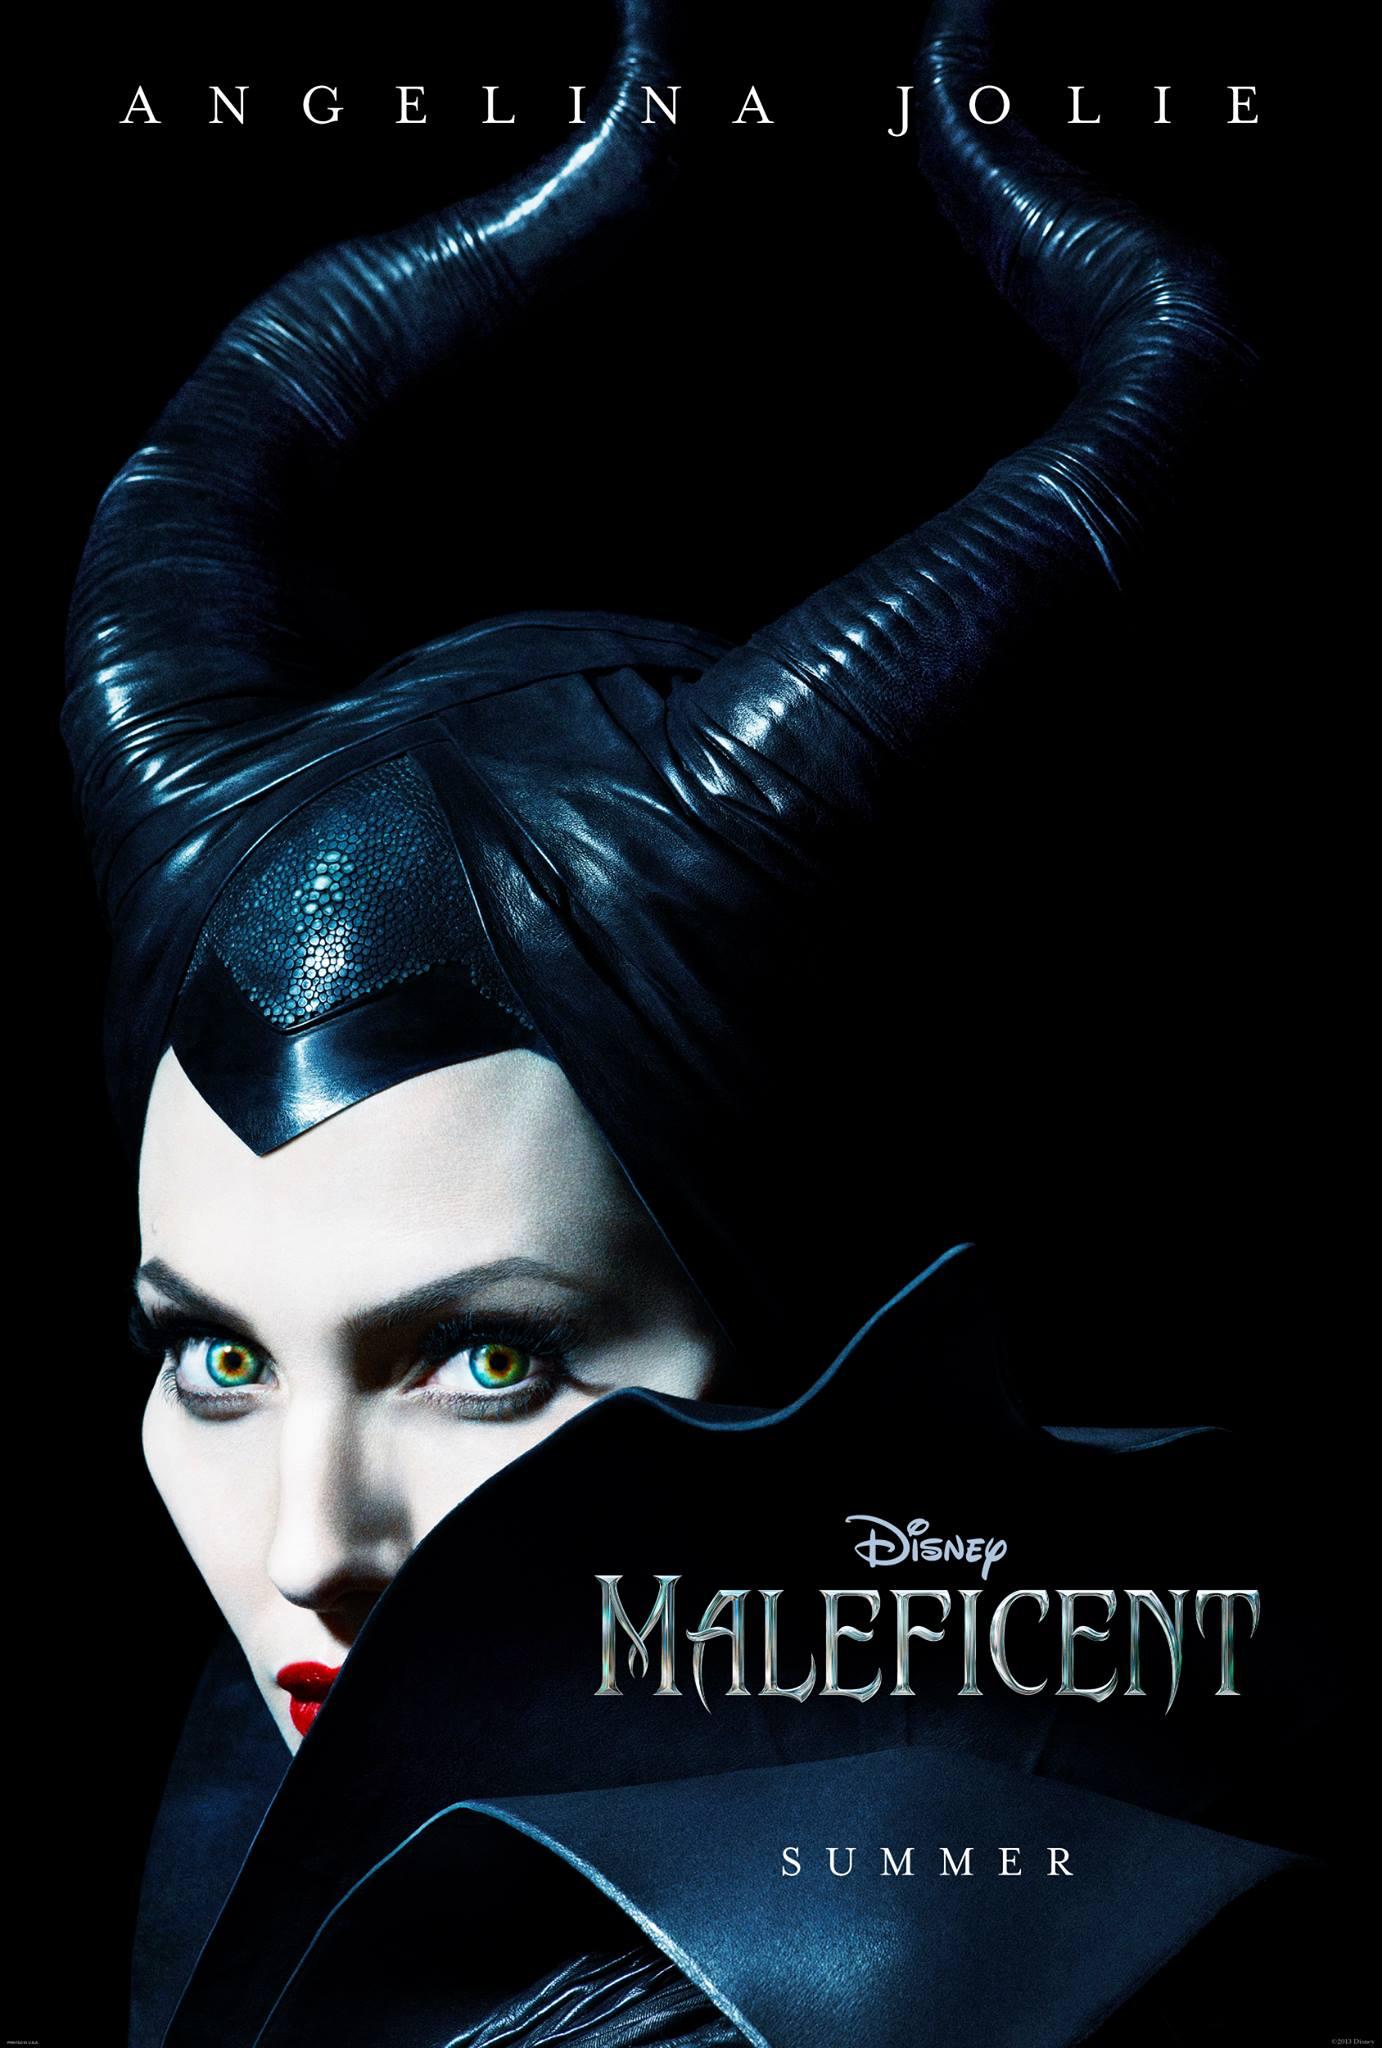 Maleficent teaser poster